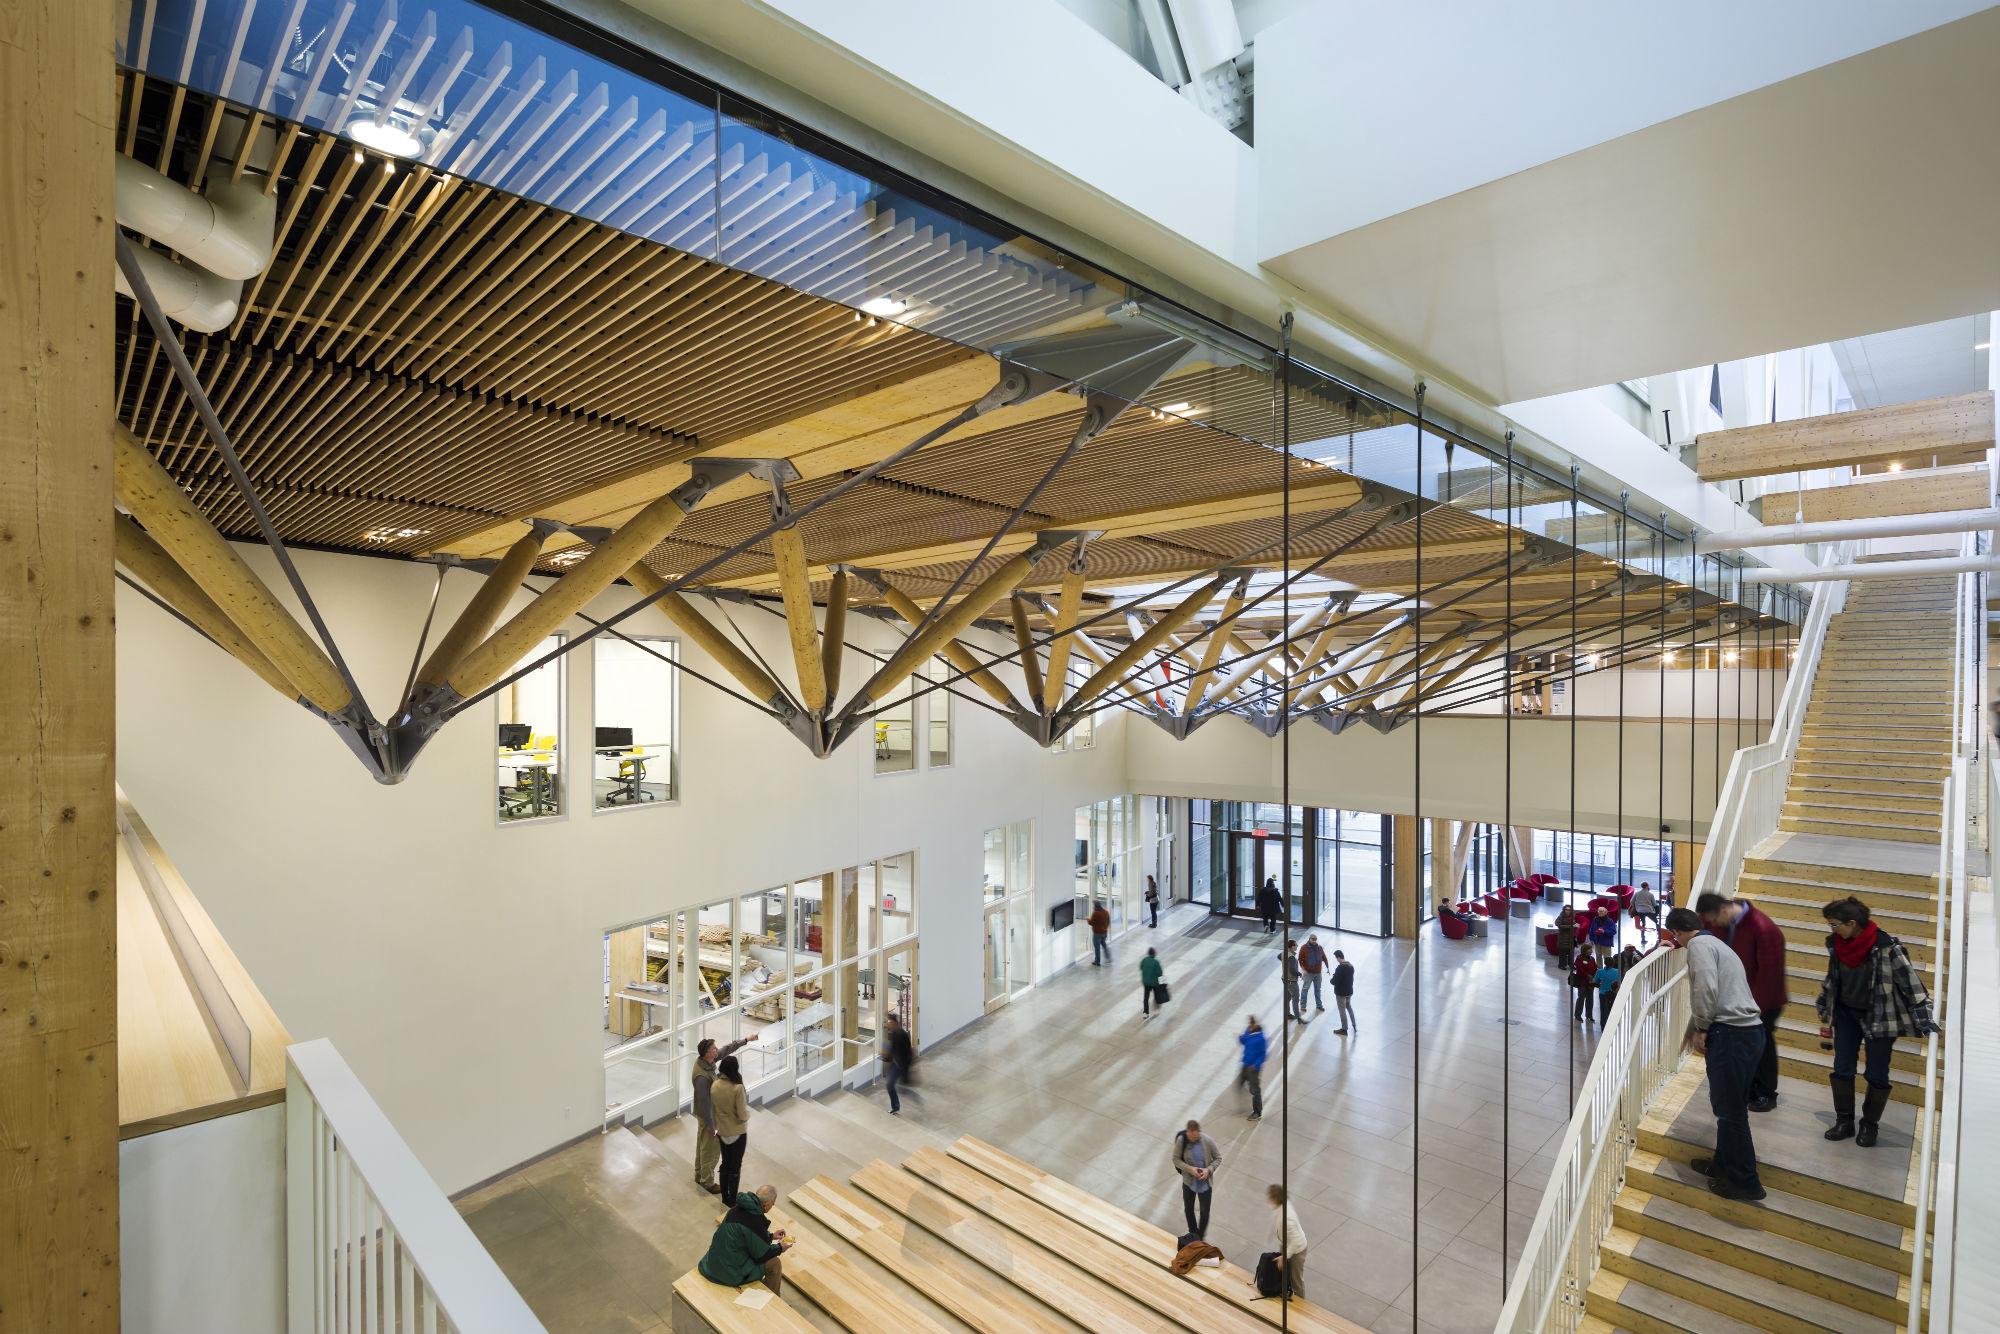 cross laminated timber design building opens at umass amherst